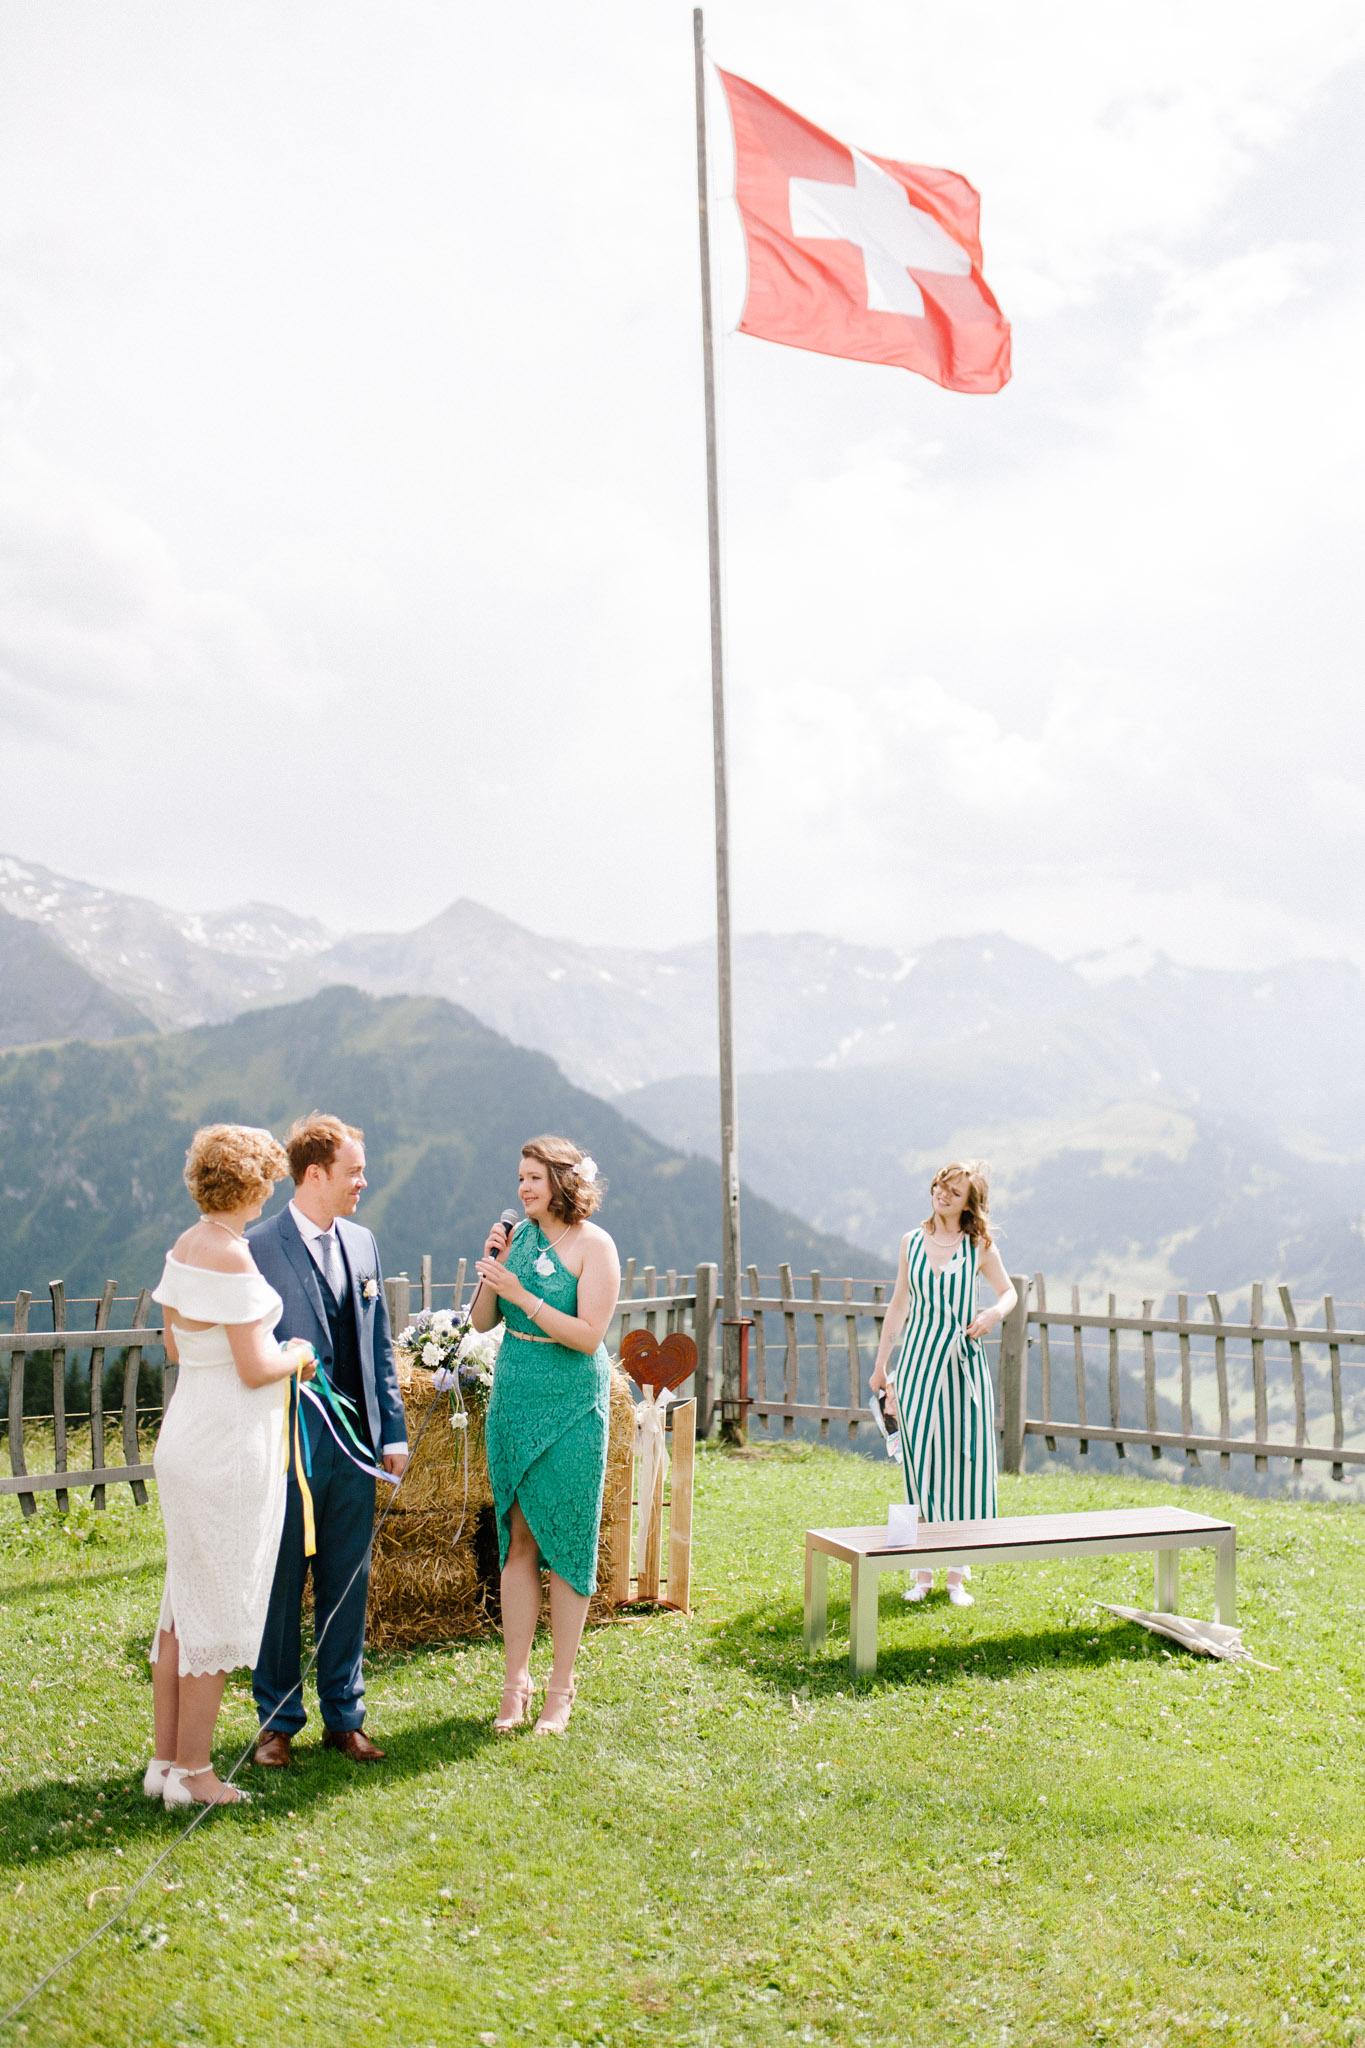 Lenl-Simmental-Buehlerhof-Pia-Anna-Christian-Wedding-Photography-EK-83.jpg